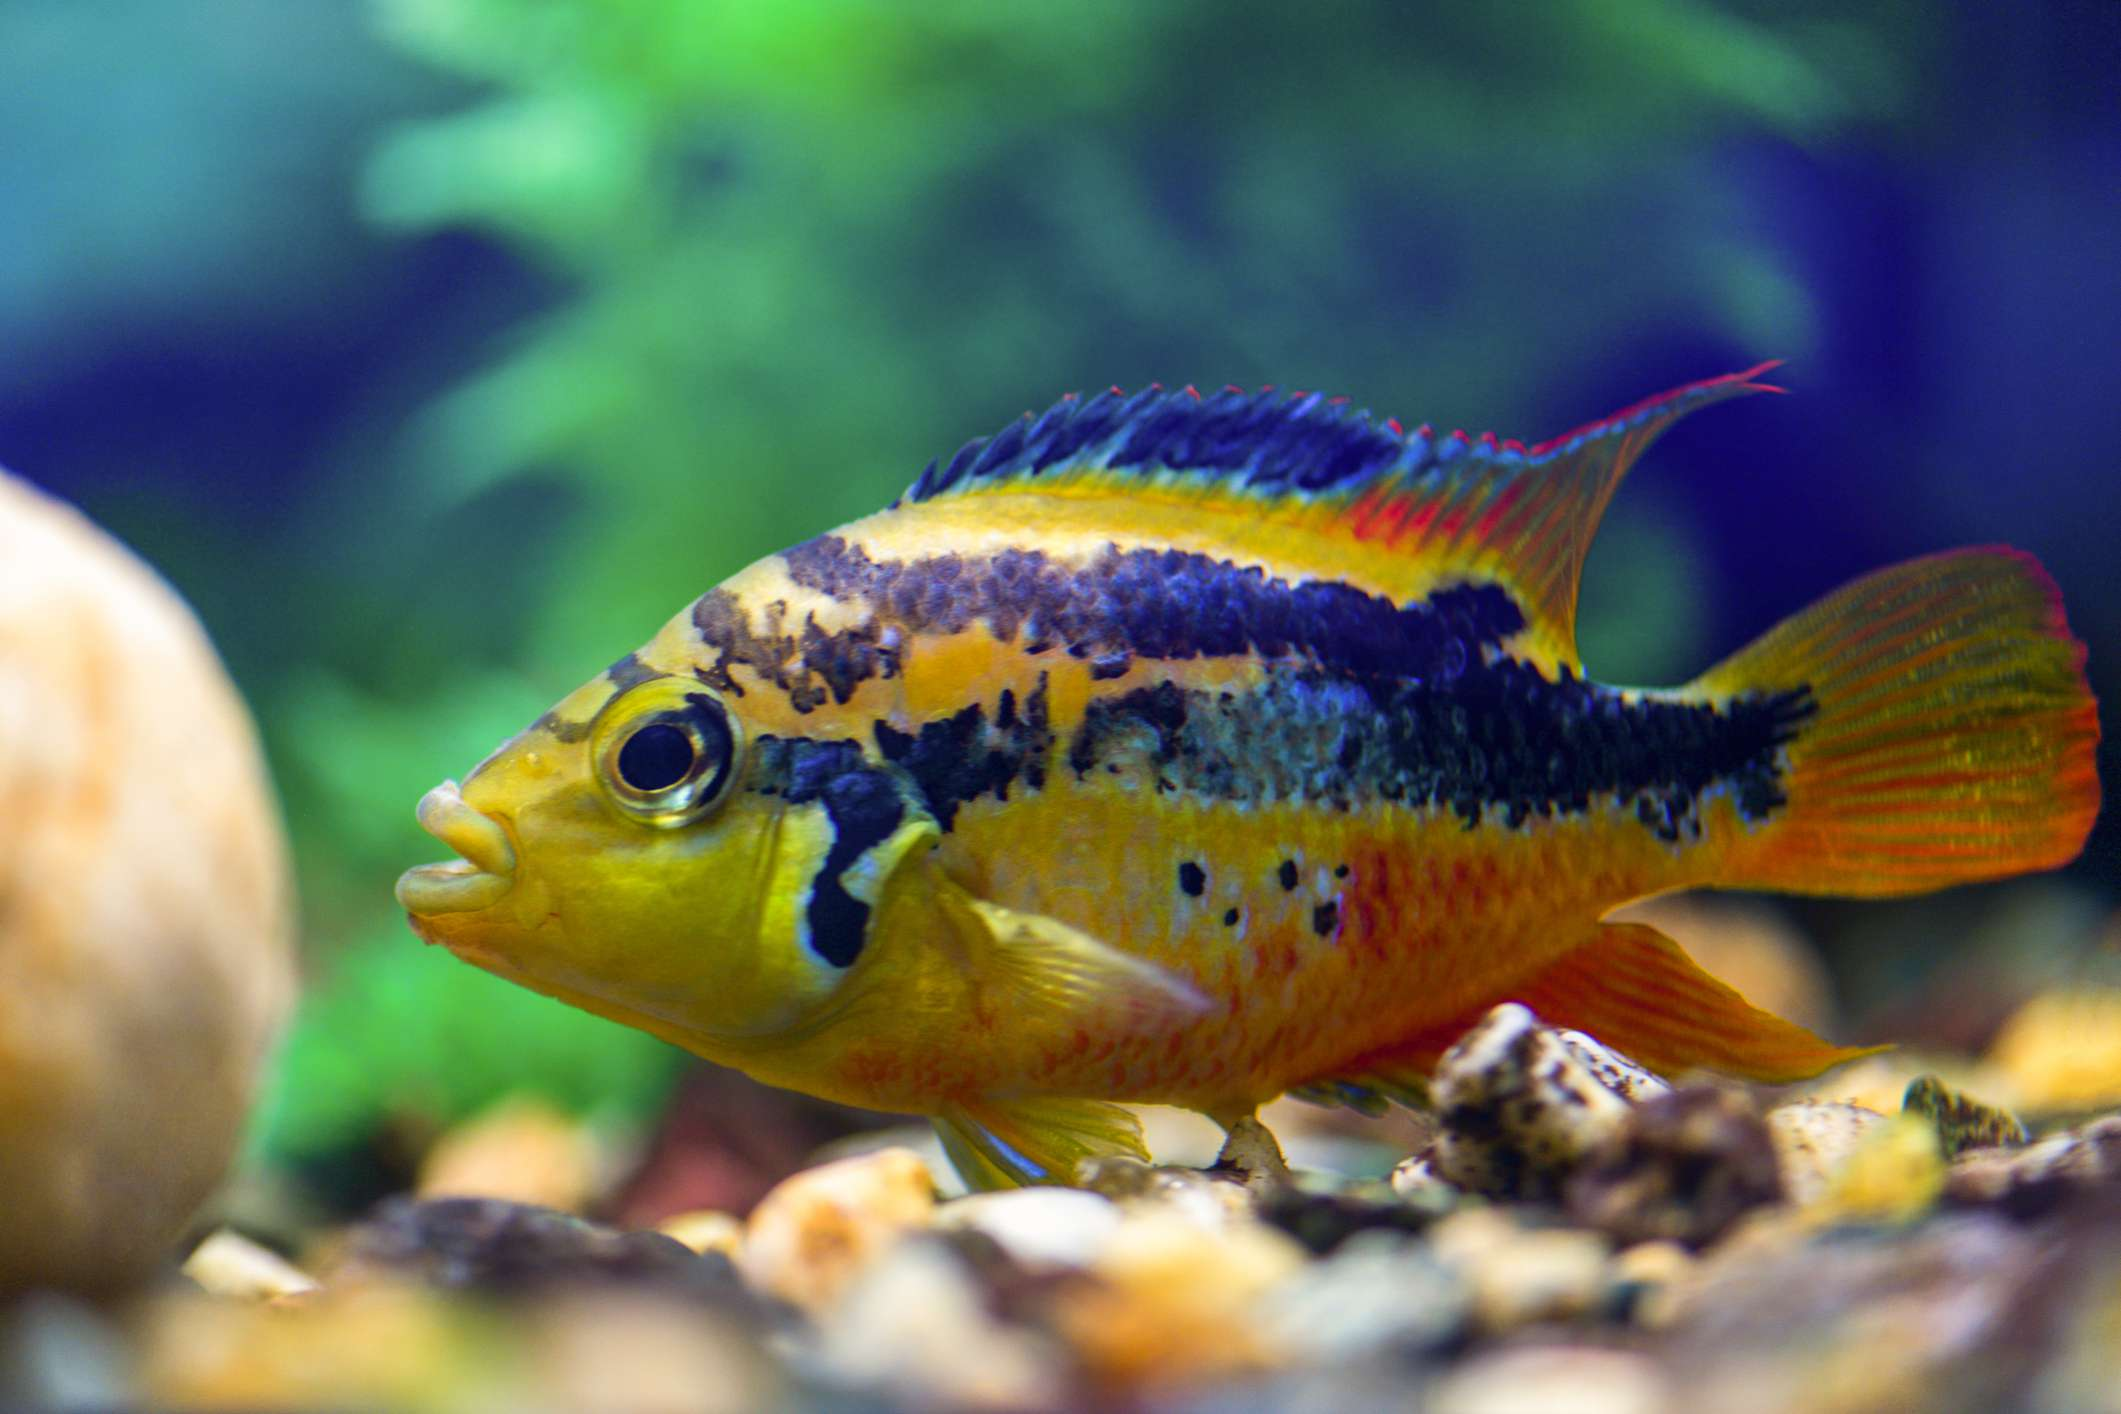 Salvini cichlid resting on bottom of aquarium